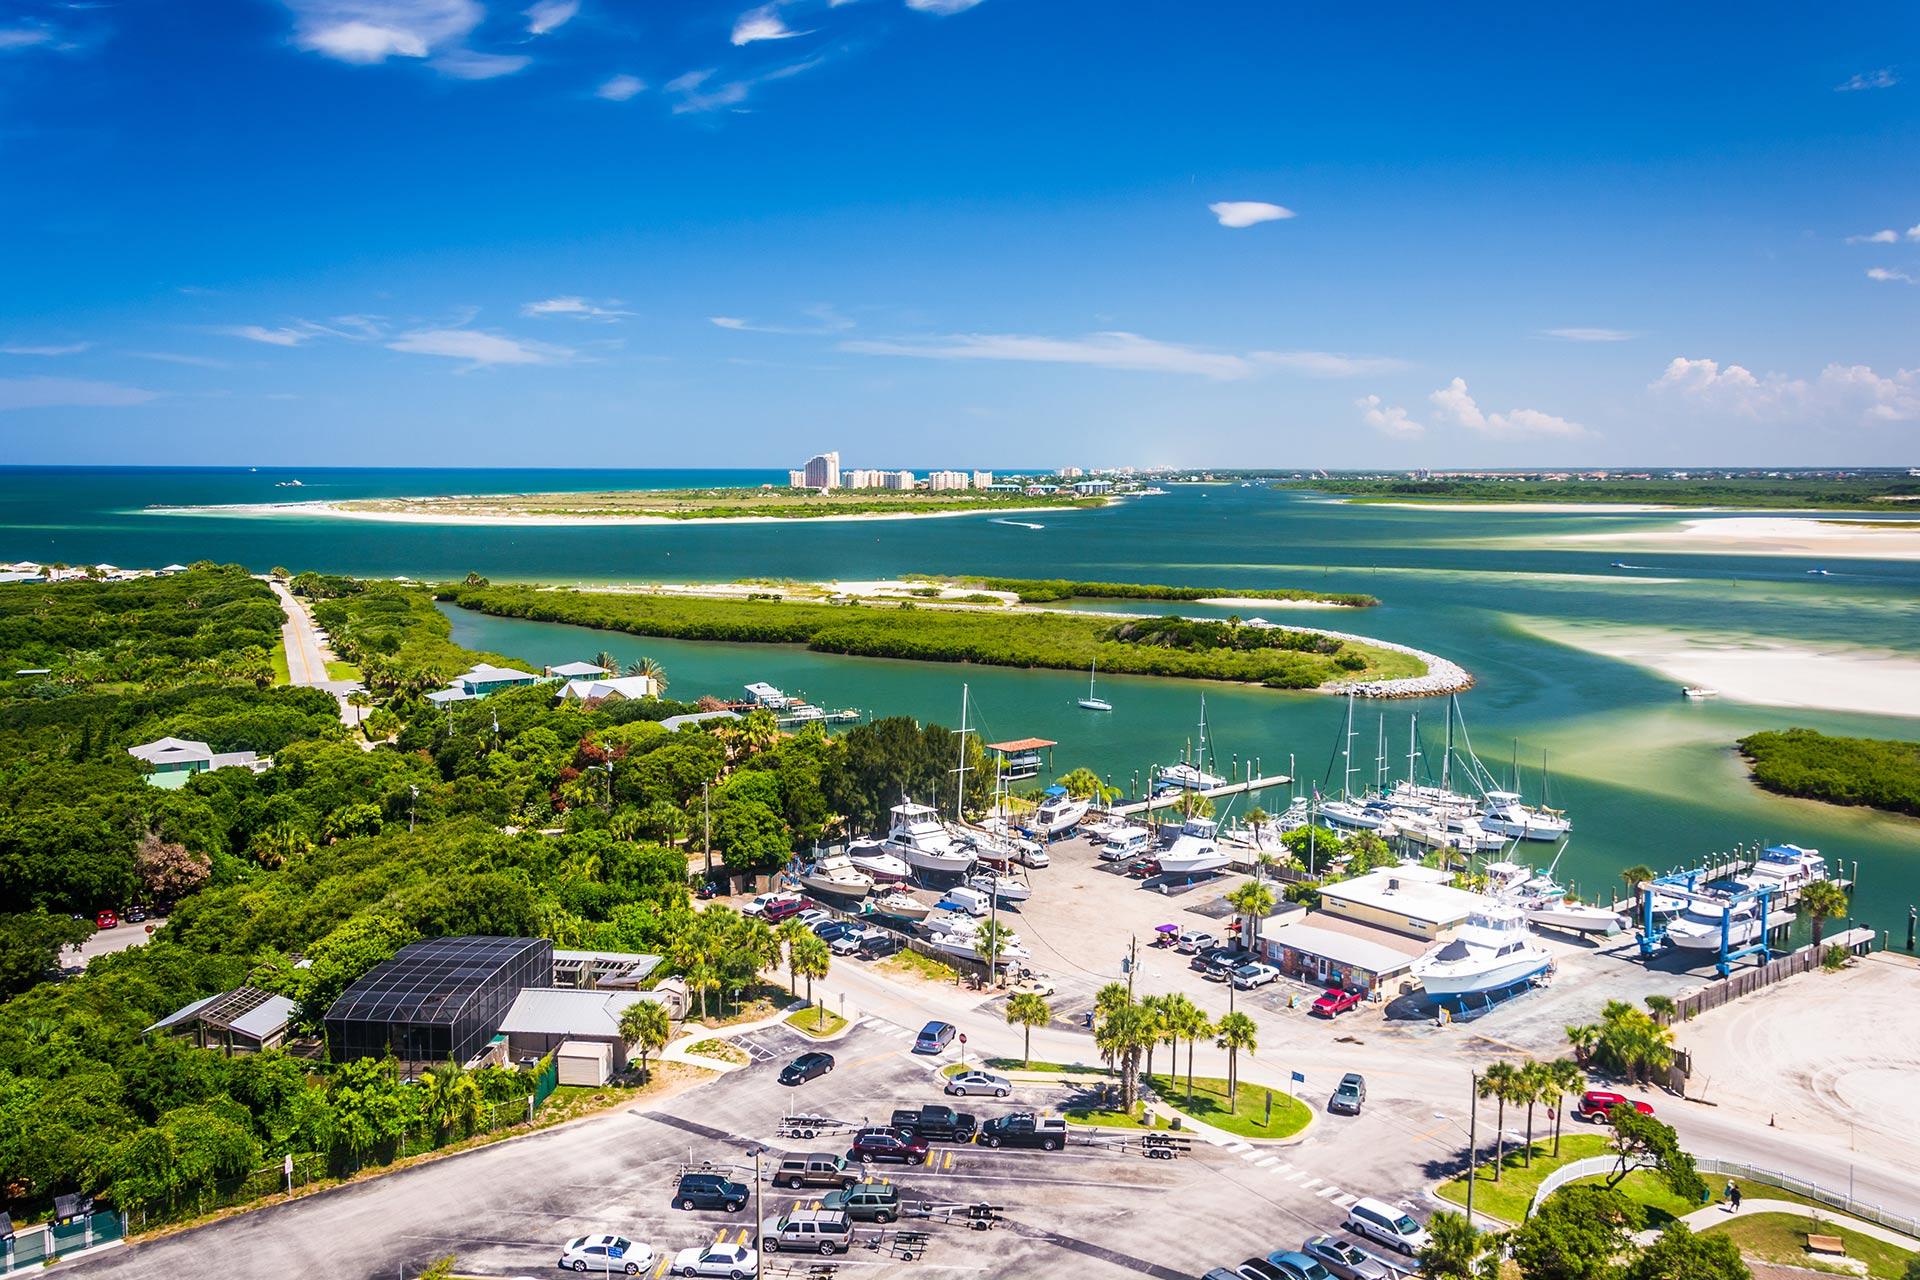 New Smyrna Beach in Florida